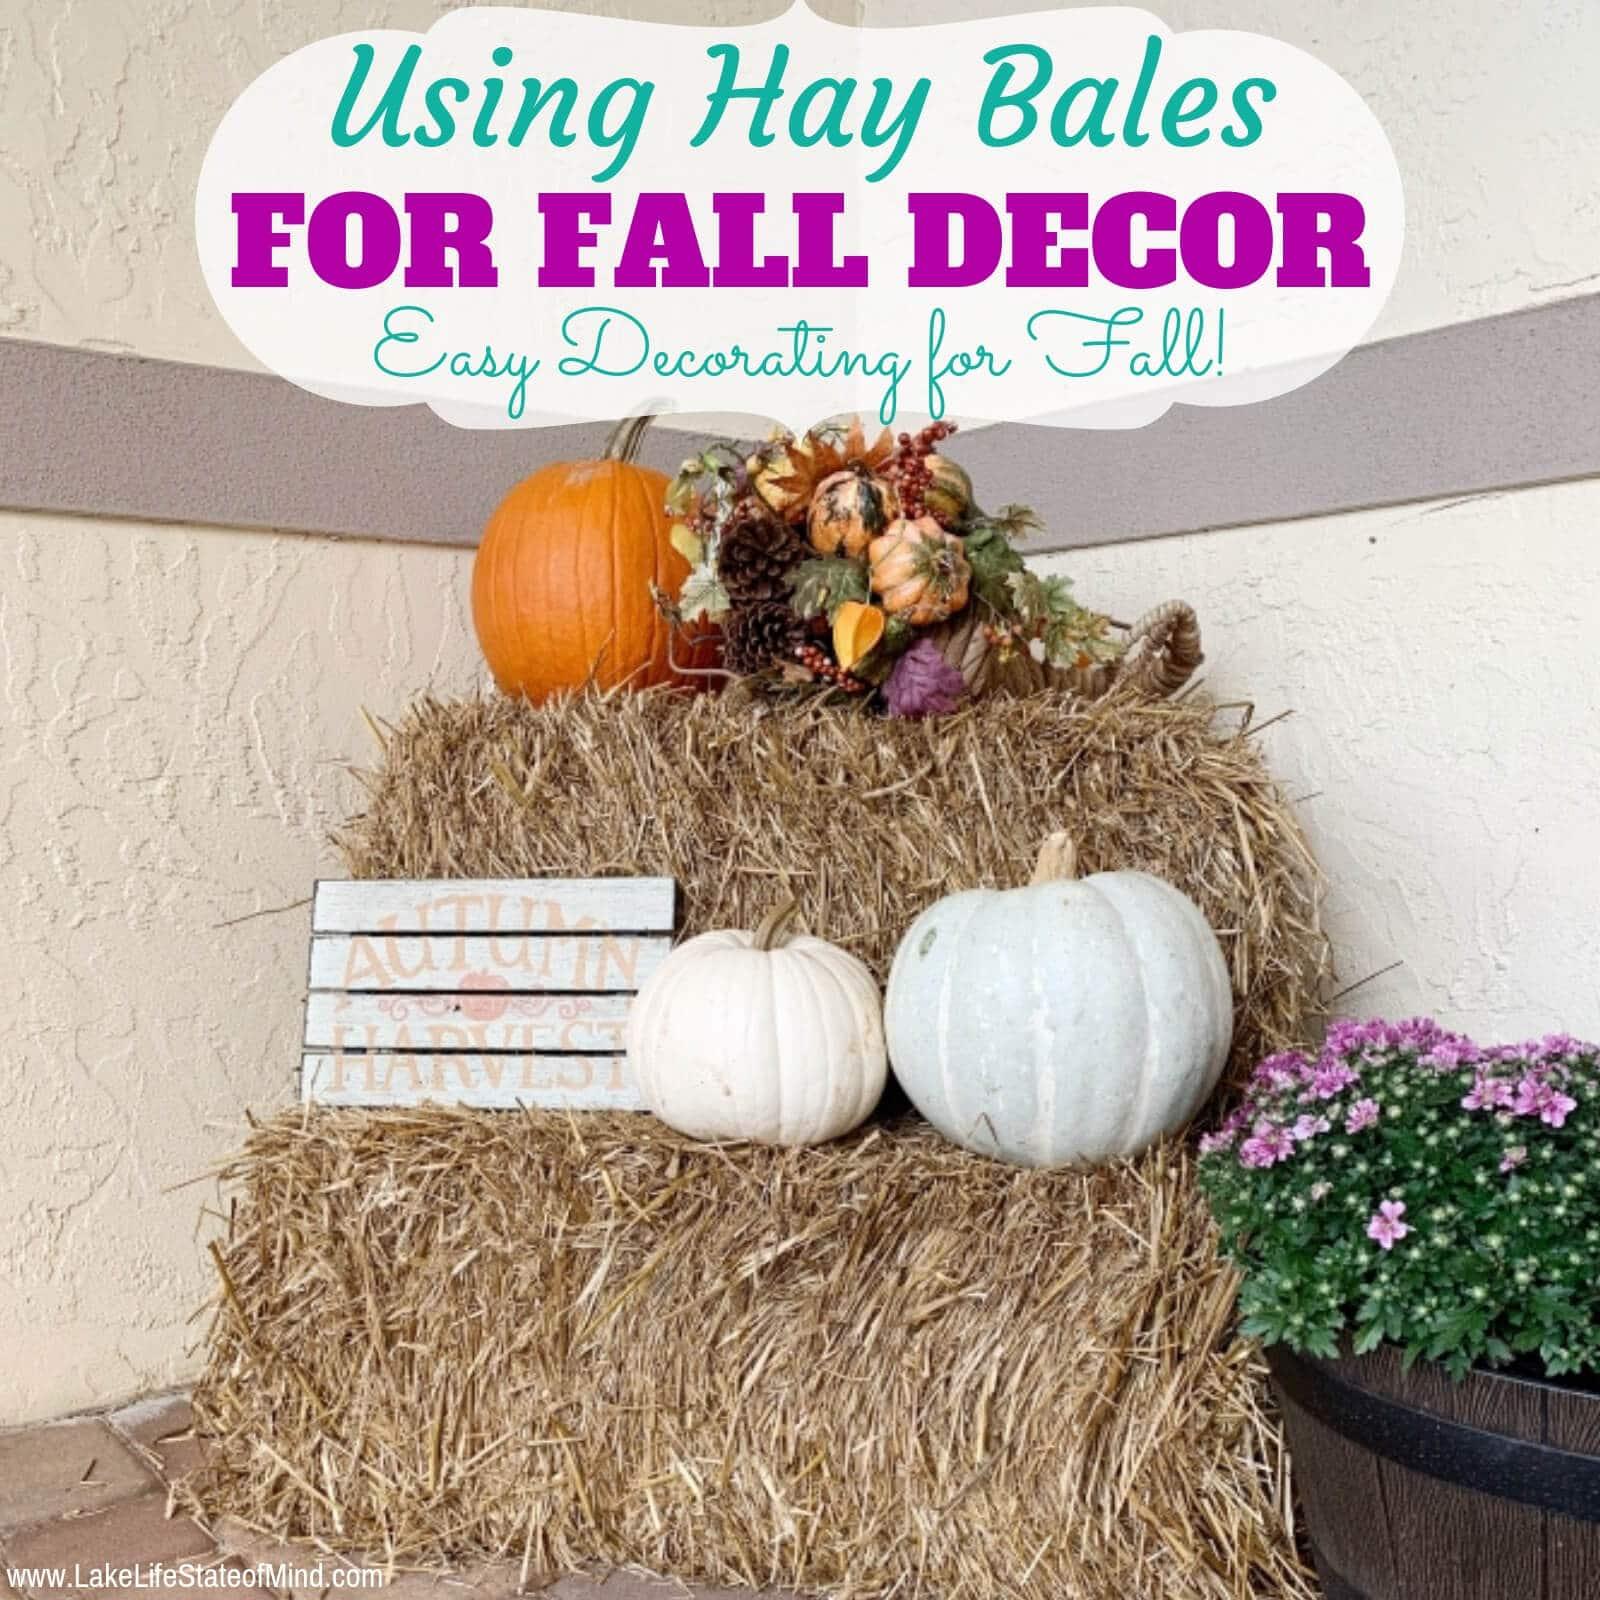 Fall Decorating Idea Using Hay Bales